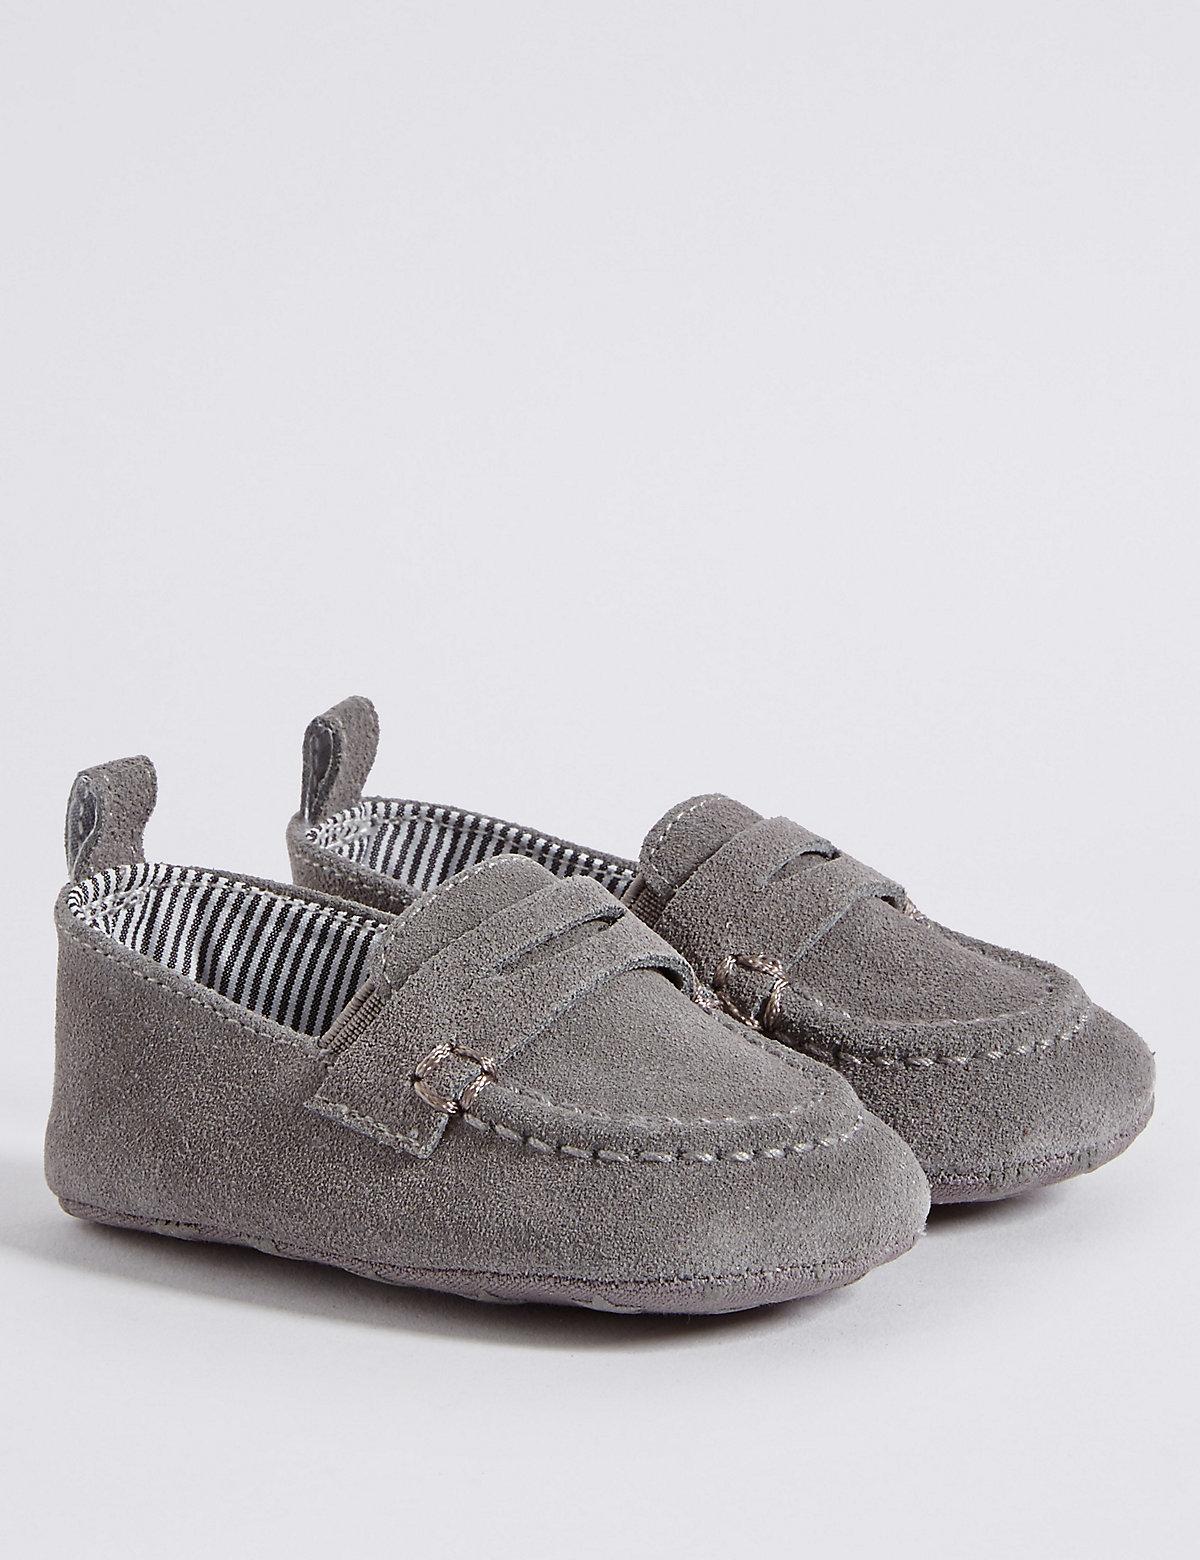 Baby Suede Pram Shoes